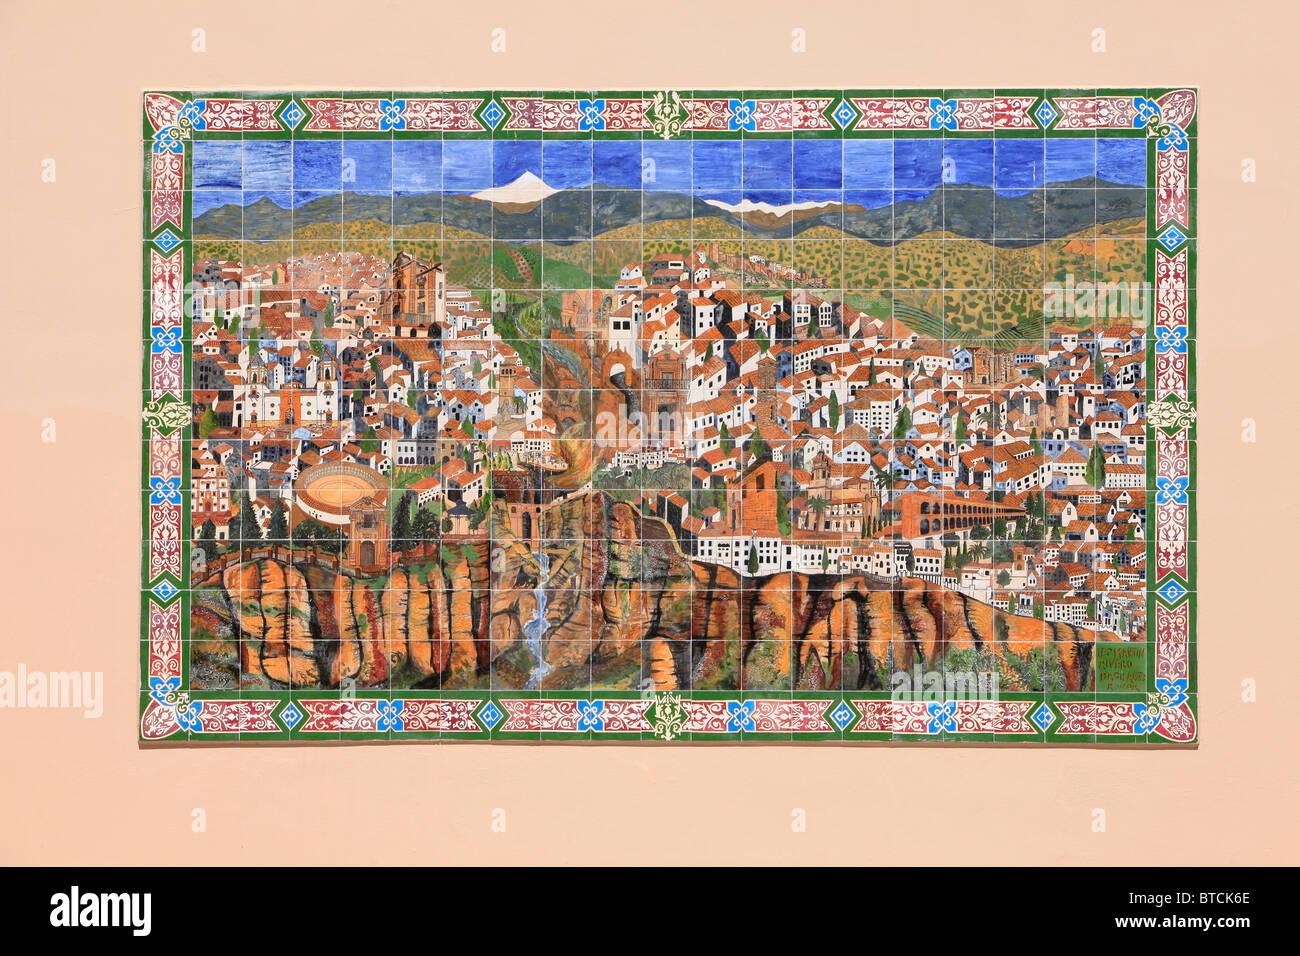 Mosaic Map Of Ronda Spain Stock Photo 32240614 Alamy